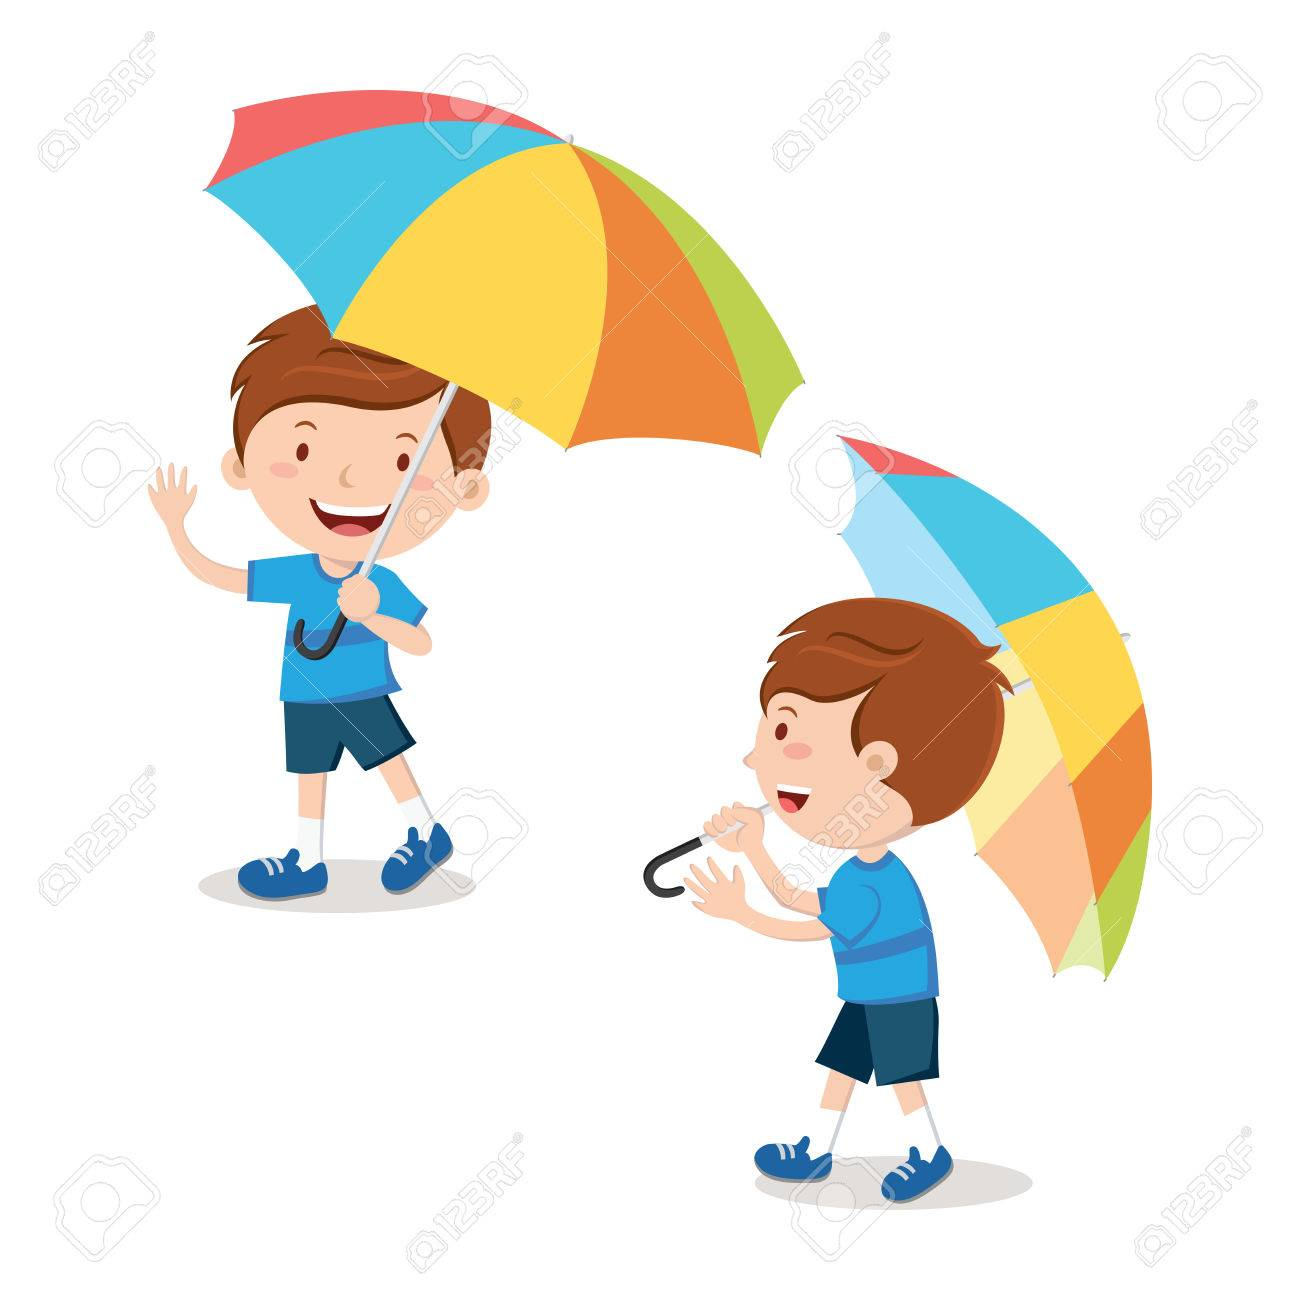 Little boy with multicolor umbrella.